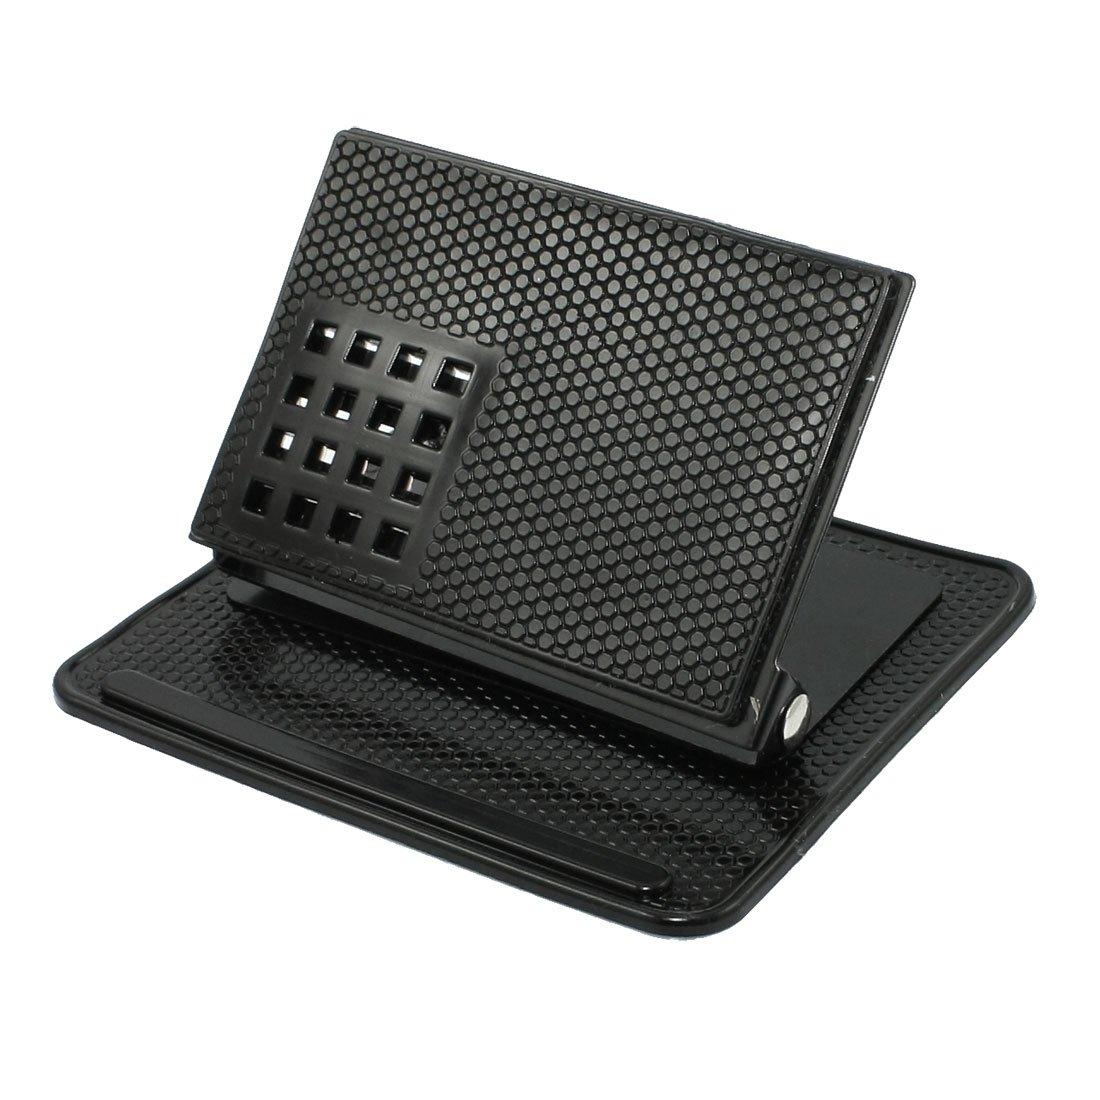 Amazon.com: uxcell Black Car Holder Bracket Cradle w Non-Slip Mat for GPS Phone: GPS & Navigation